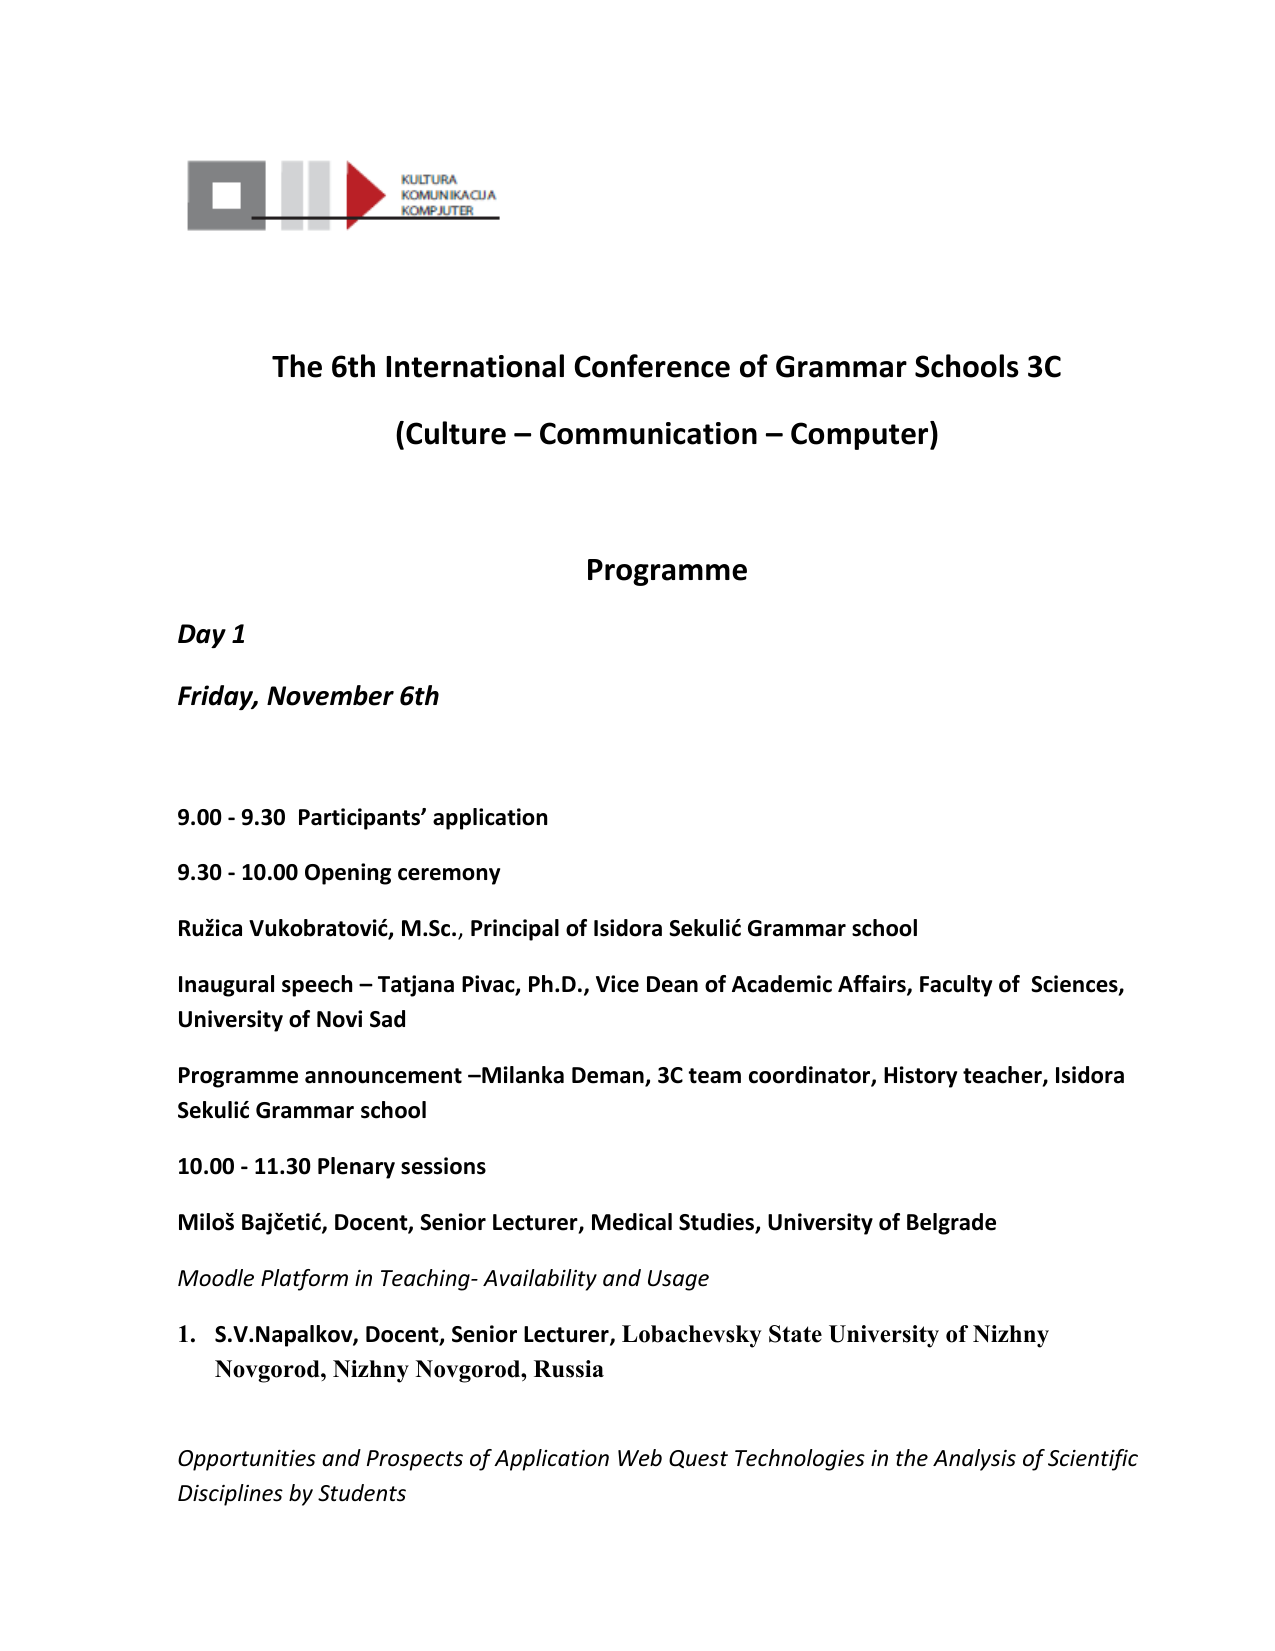 Programme announcement –Milanka Deman, 3C team coordinator